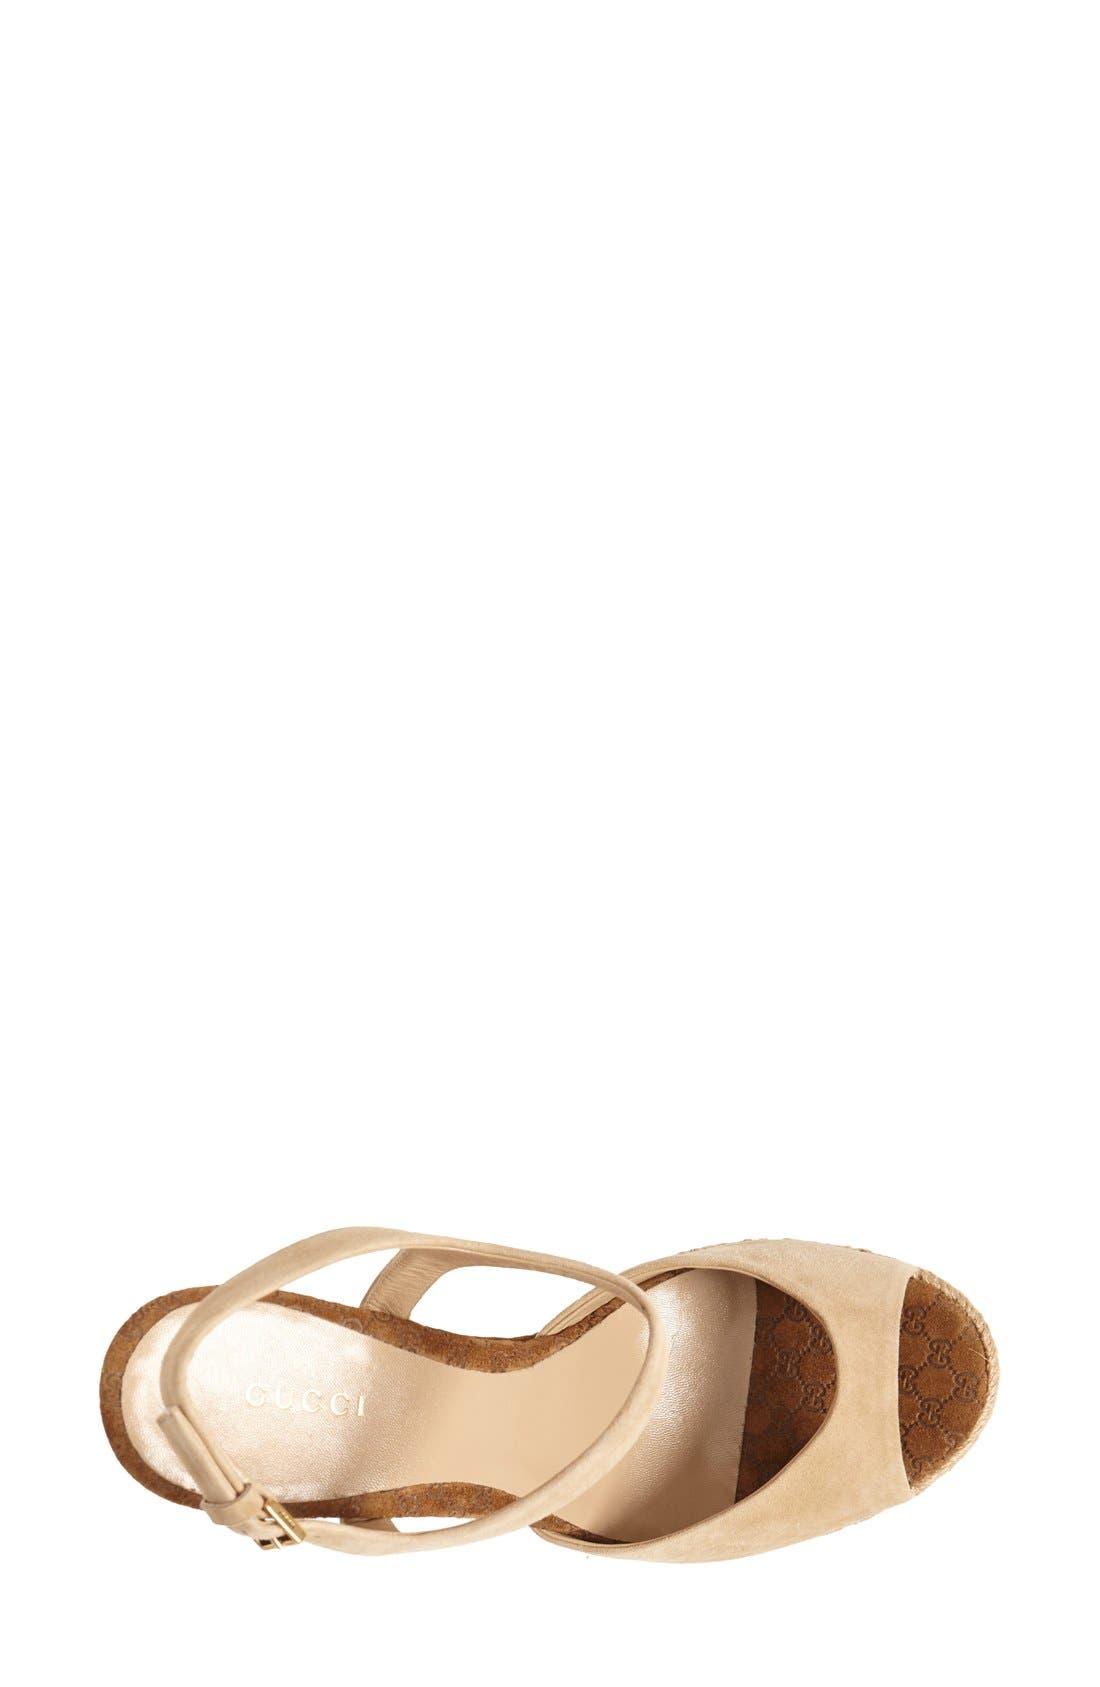 Alternate Image 3  - Gucci 'Hollie' Wedge Sandal (Women)